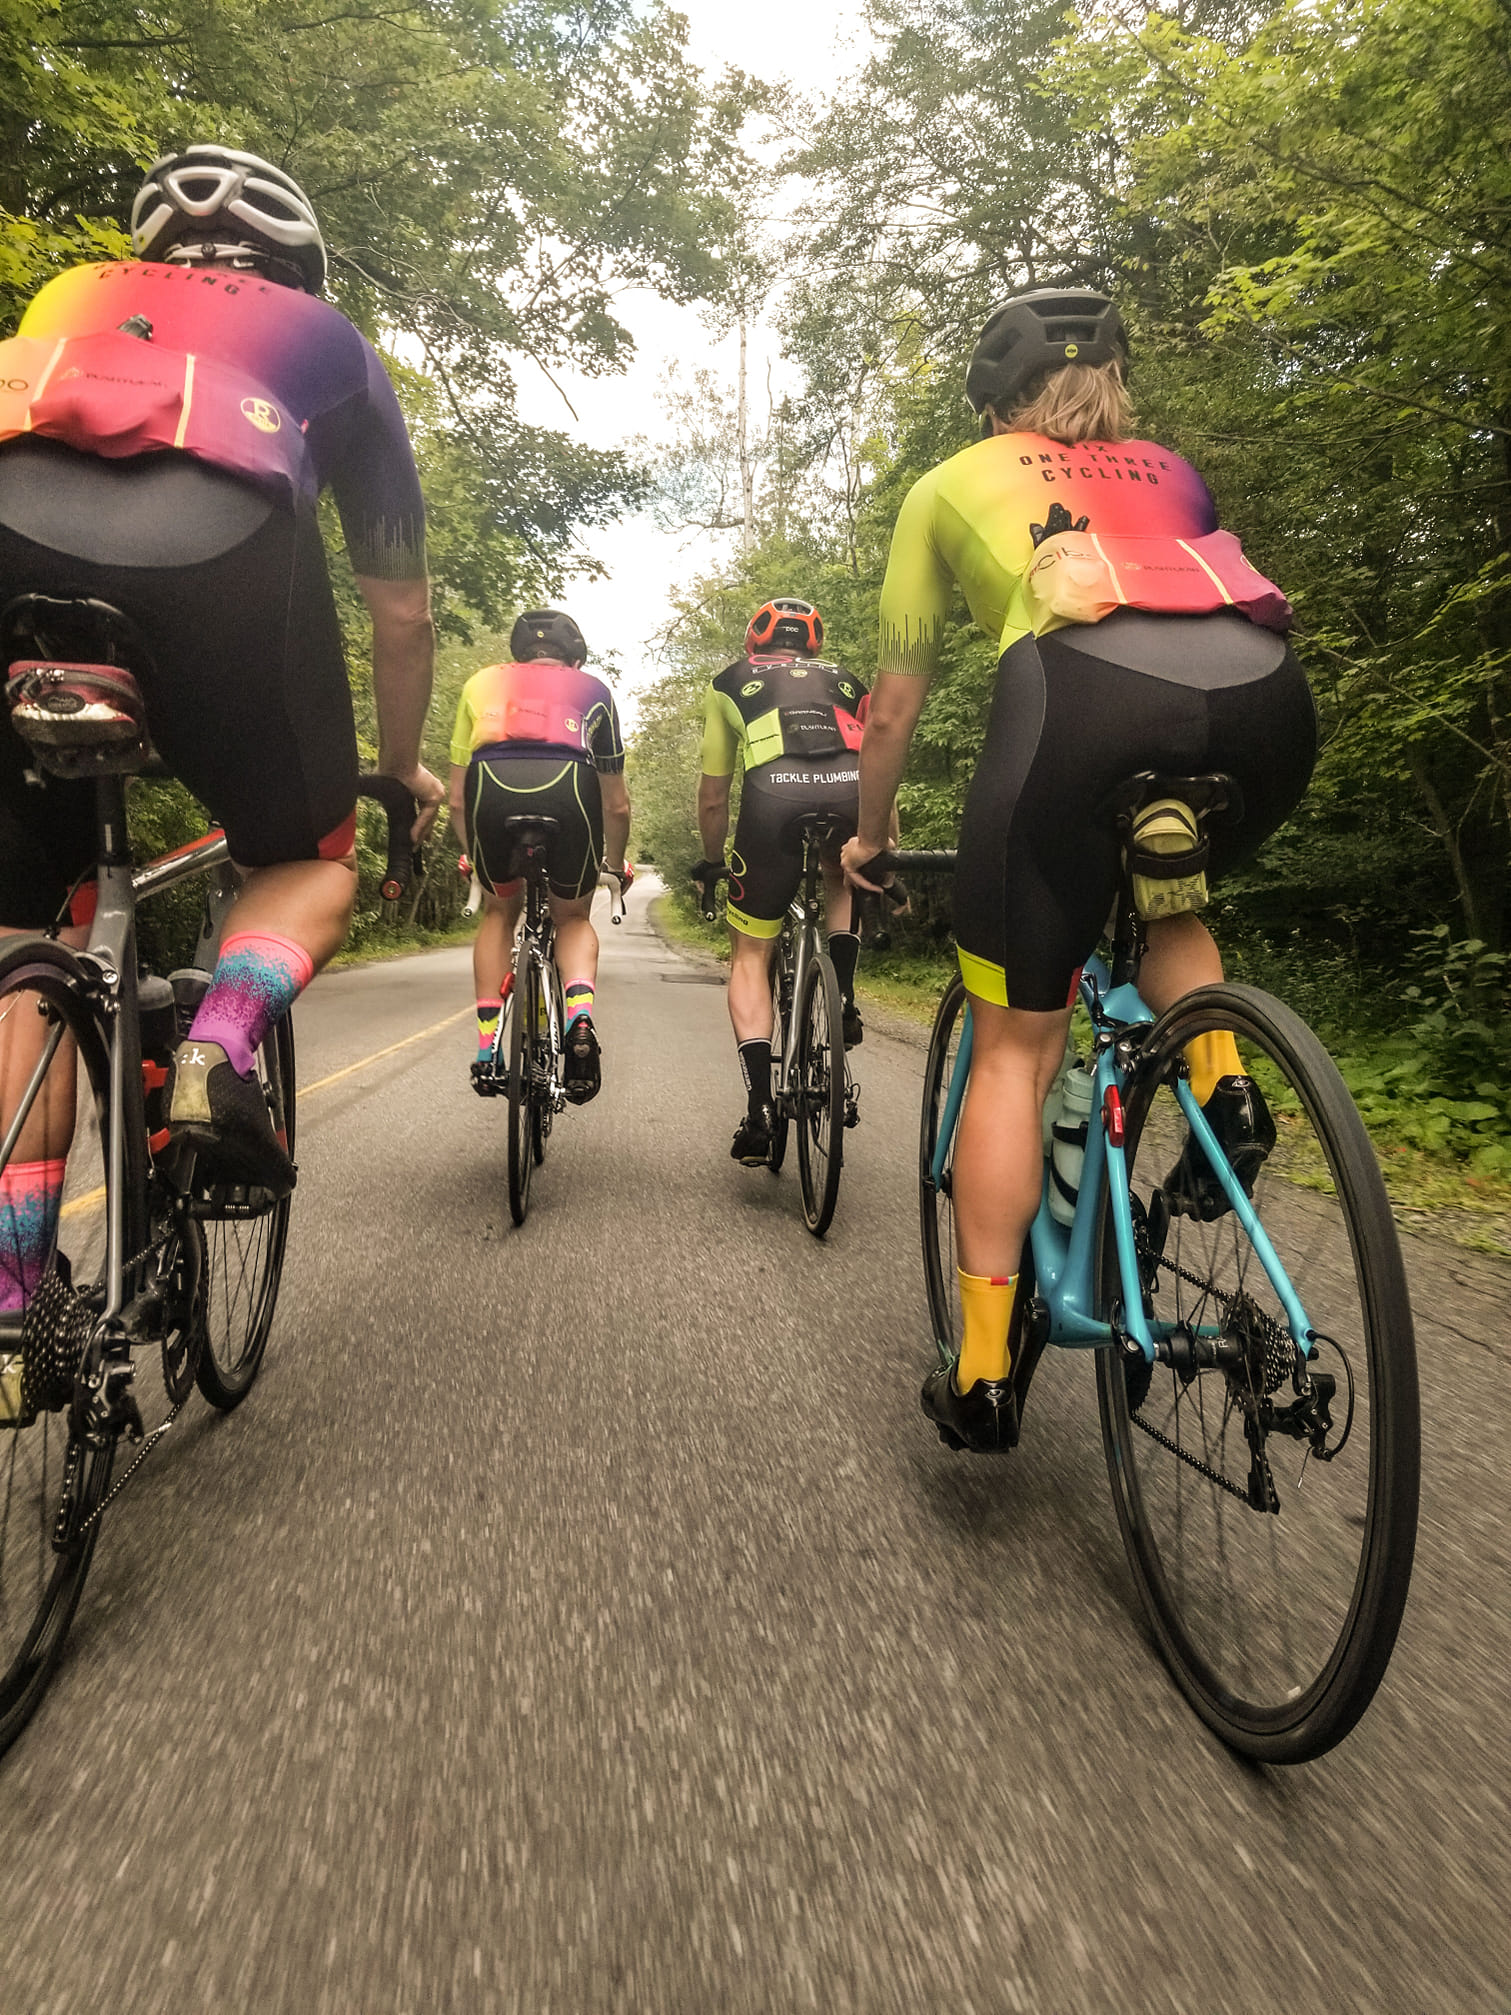 riders enjoying their bike ride because of their great bike fit